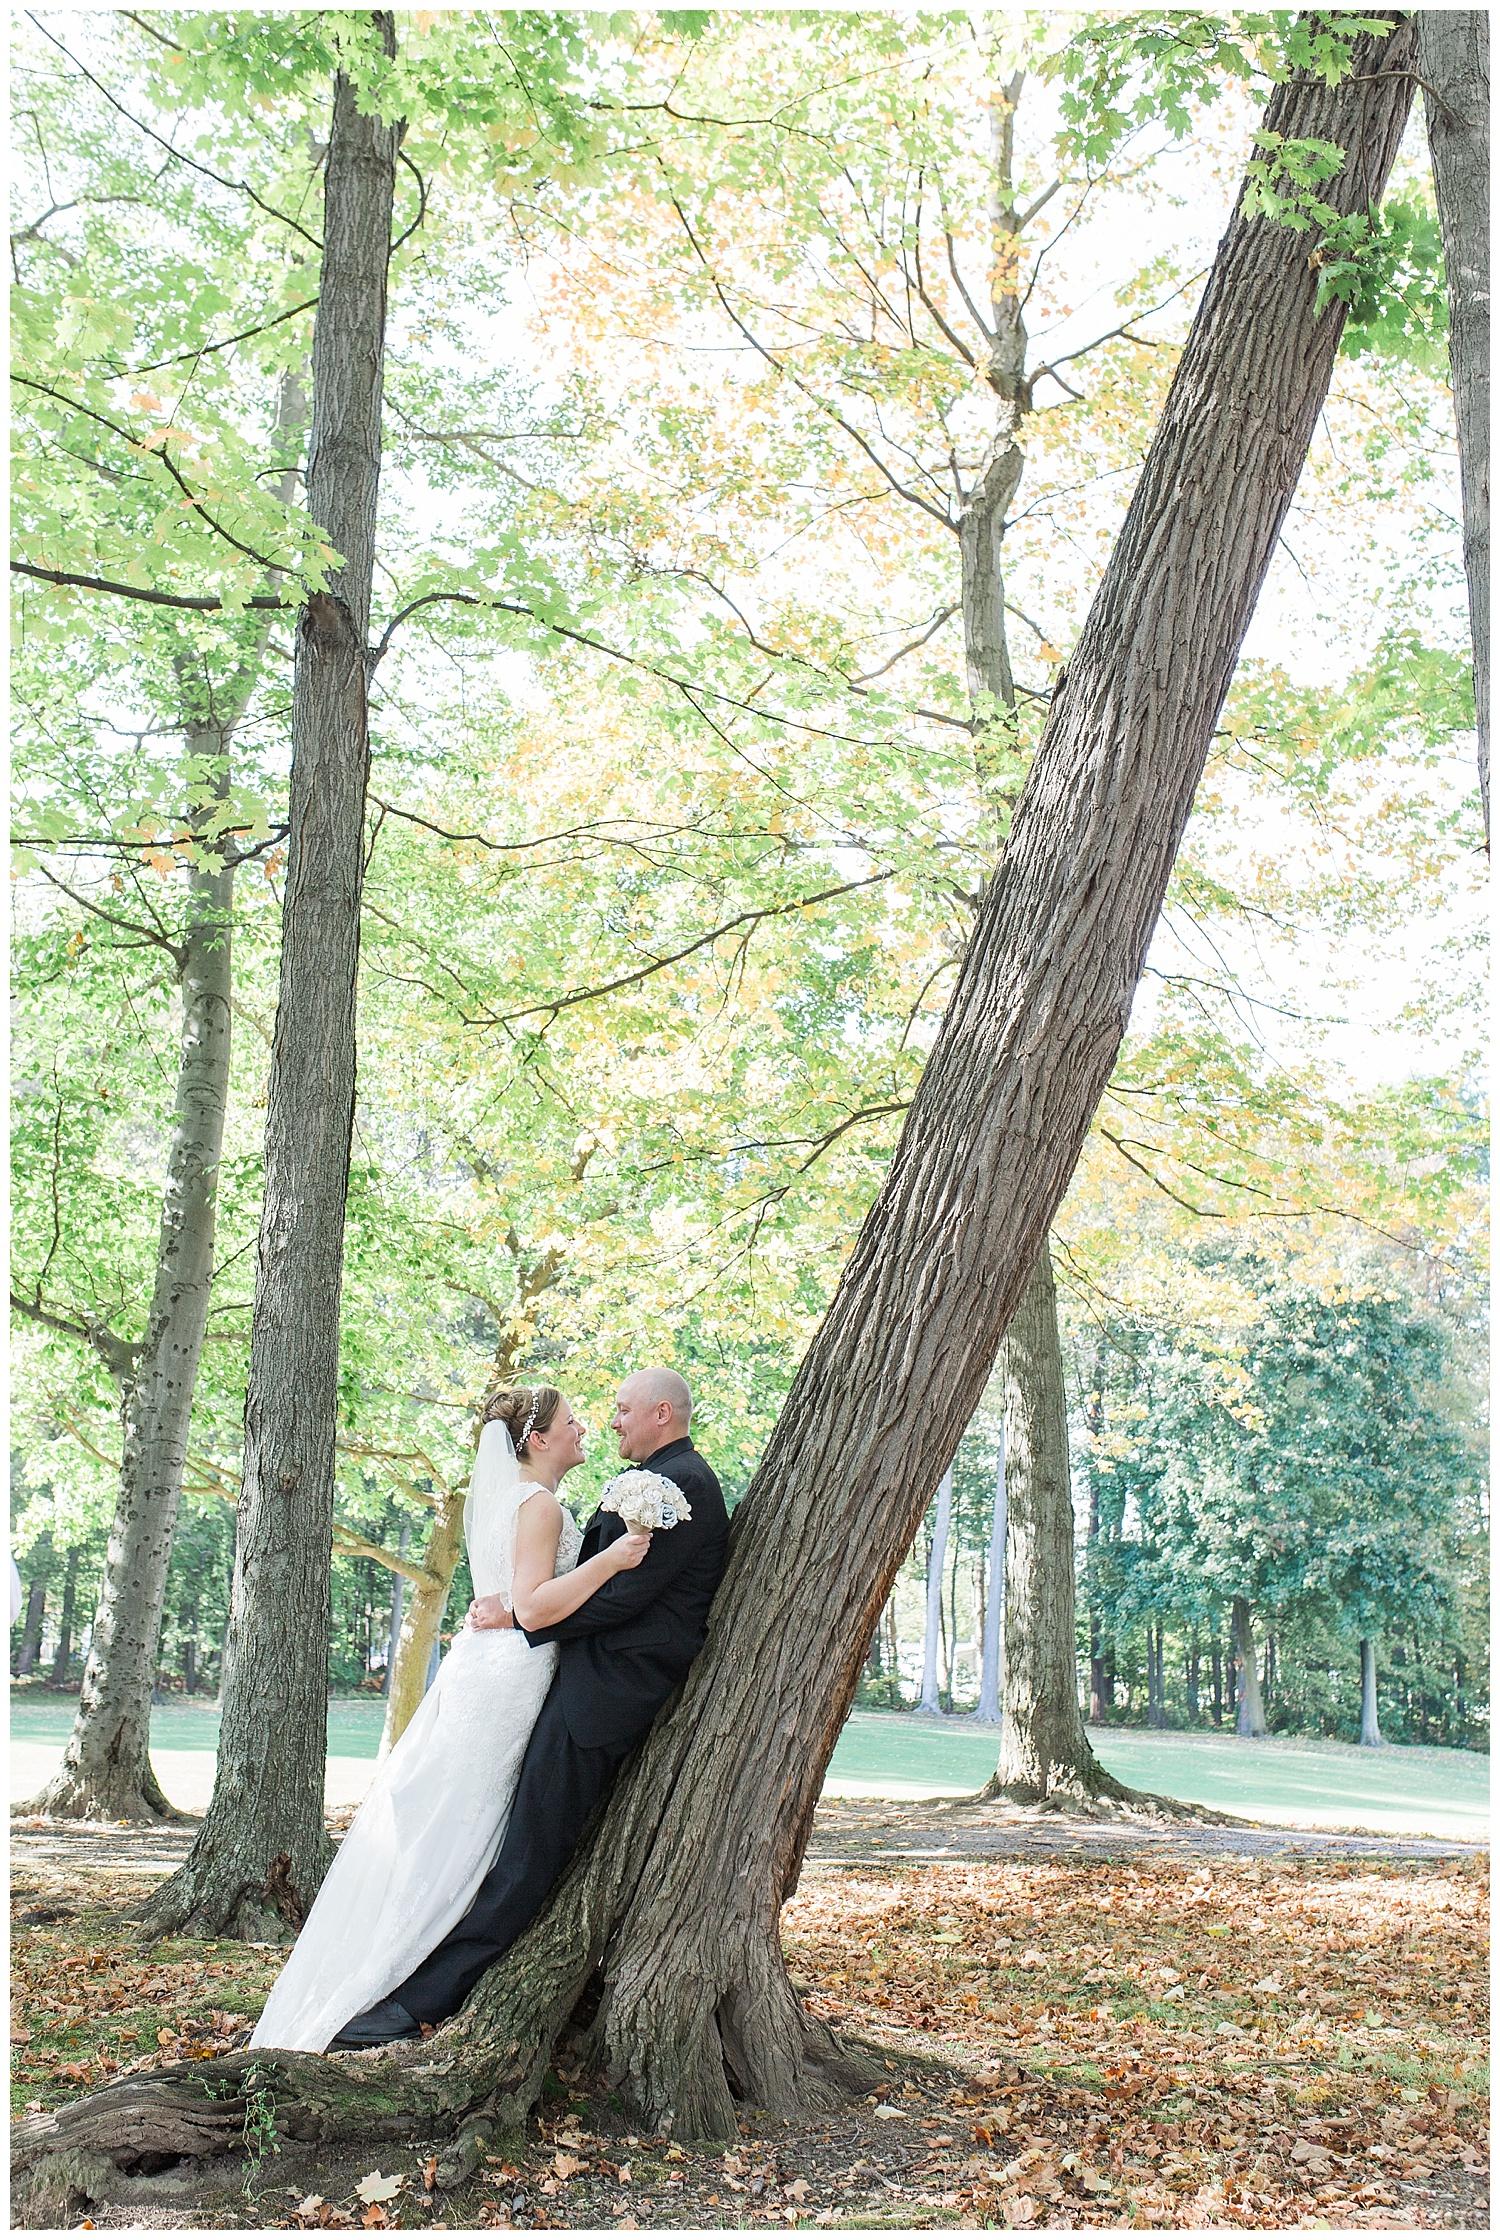 Jessica and Scott McKay - Terry Hills Golf Course - Batavia NY - Lass and Beau-306_Buffalo wedding photography.jpg